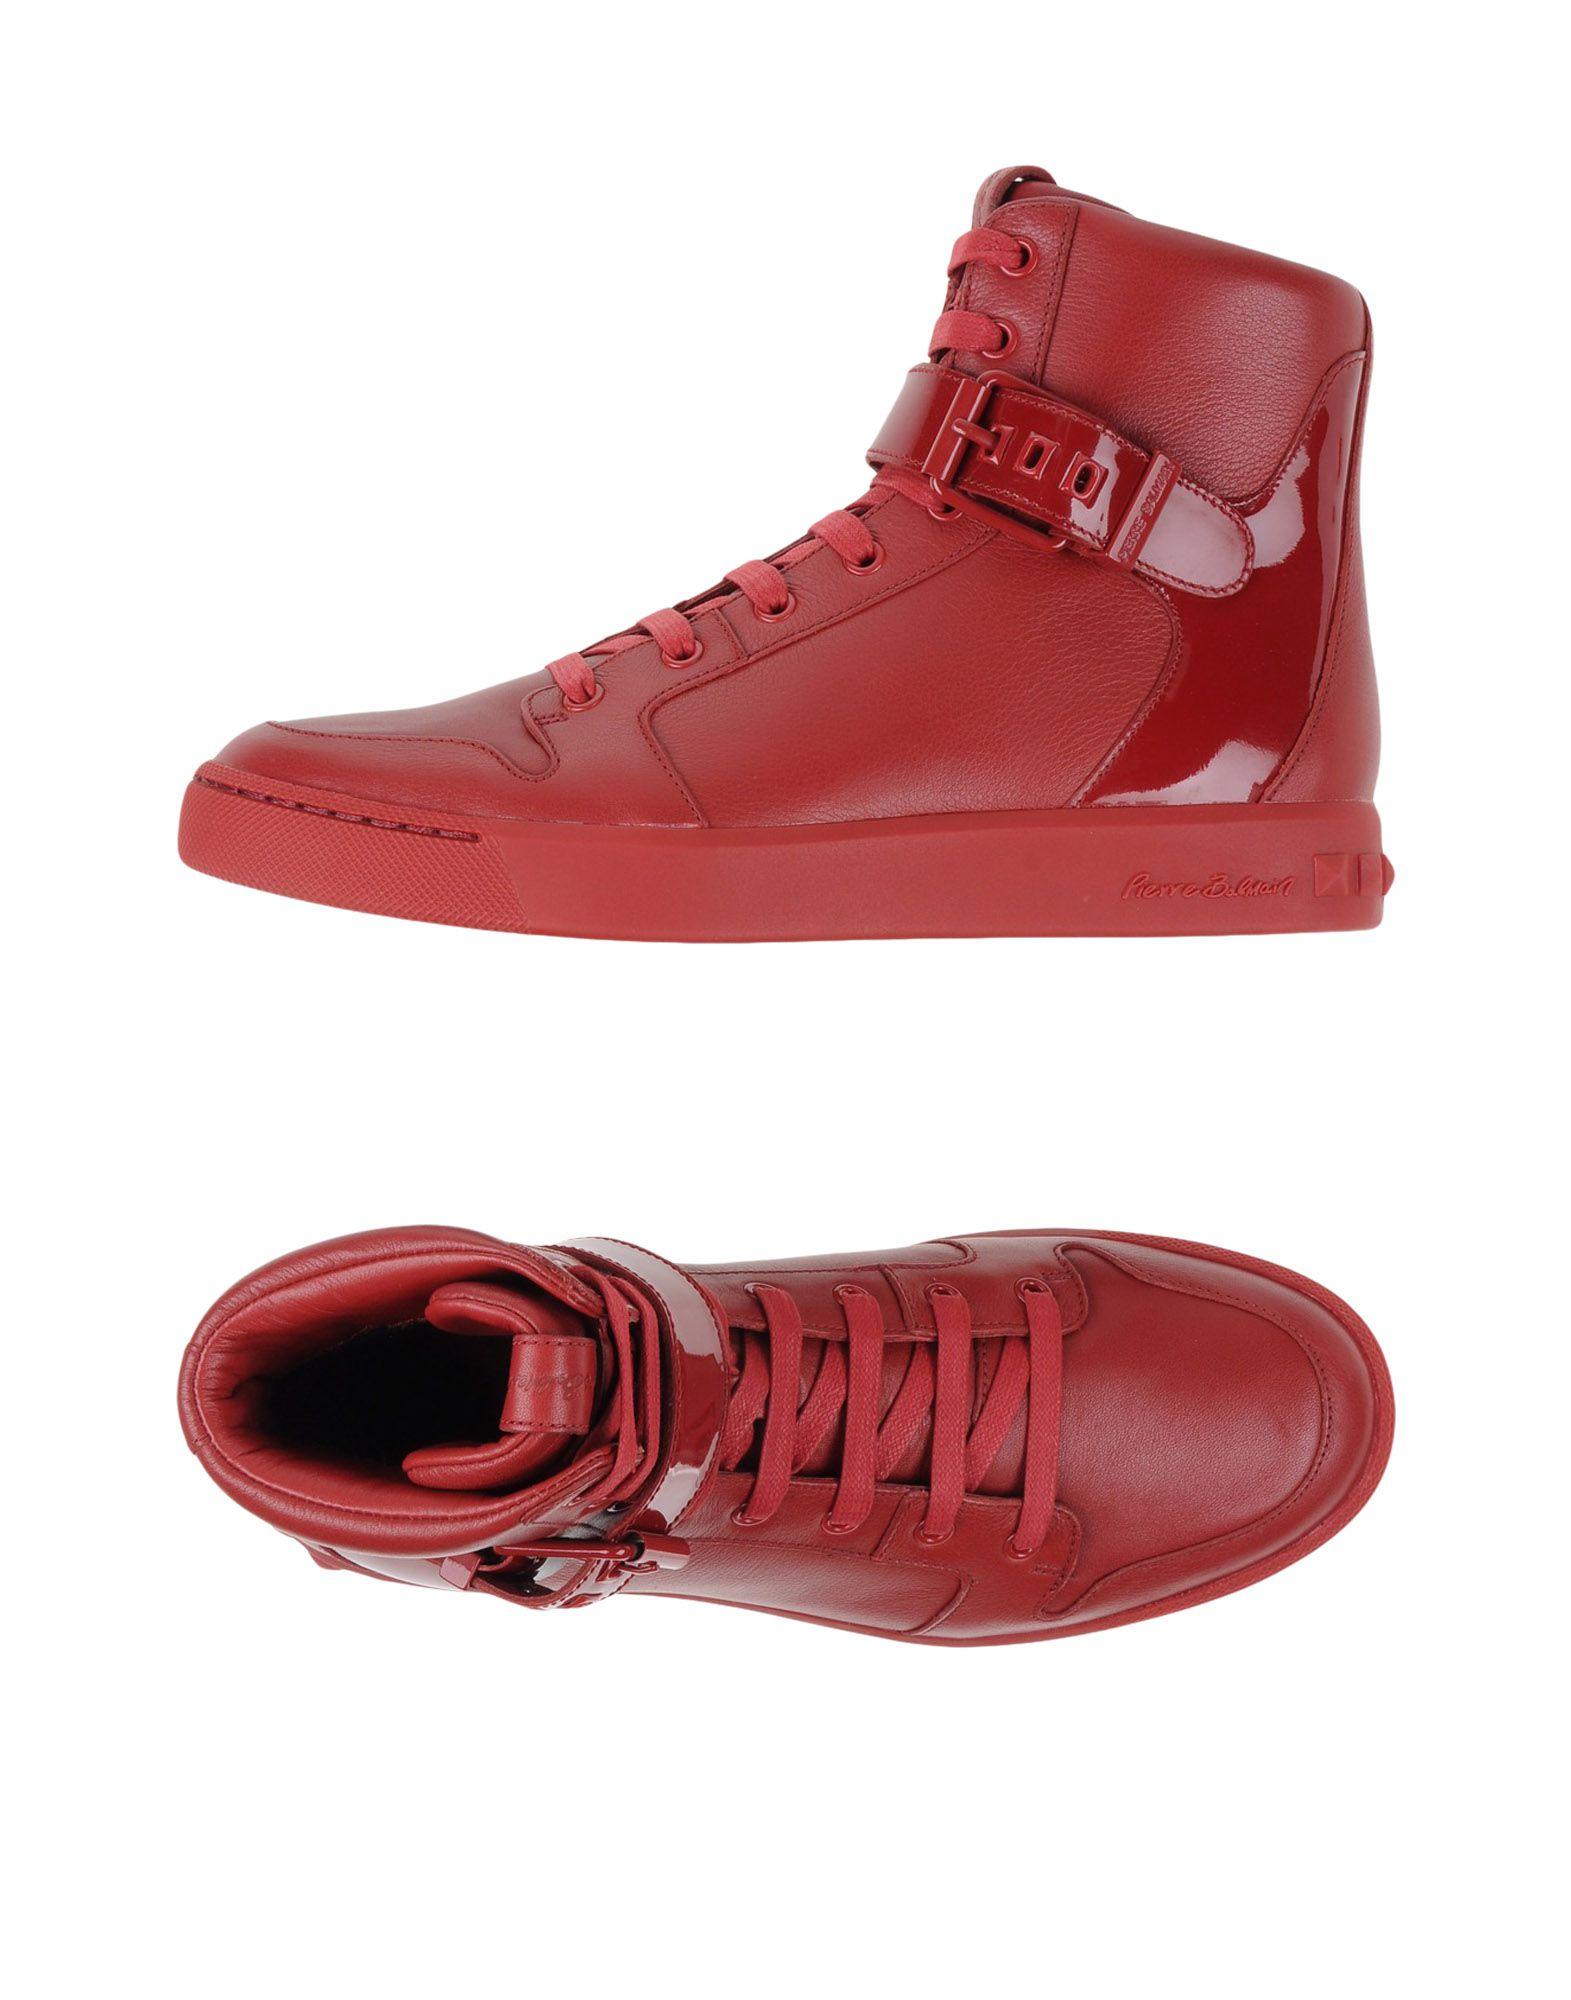 Pierre Balmain Sneakers Herren  11009195ML Gute Qualität beliebte Schuhe